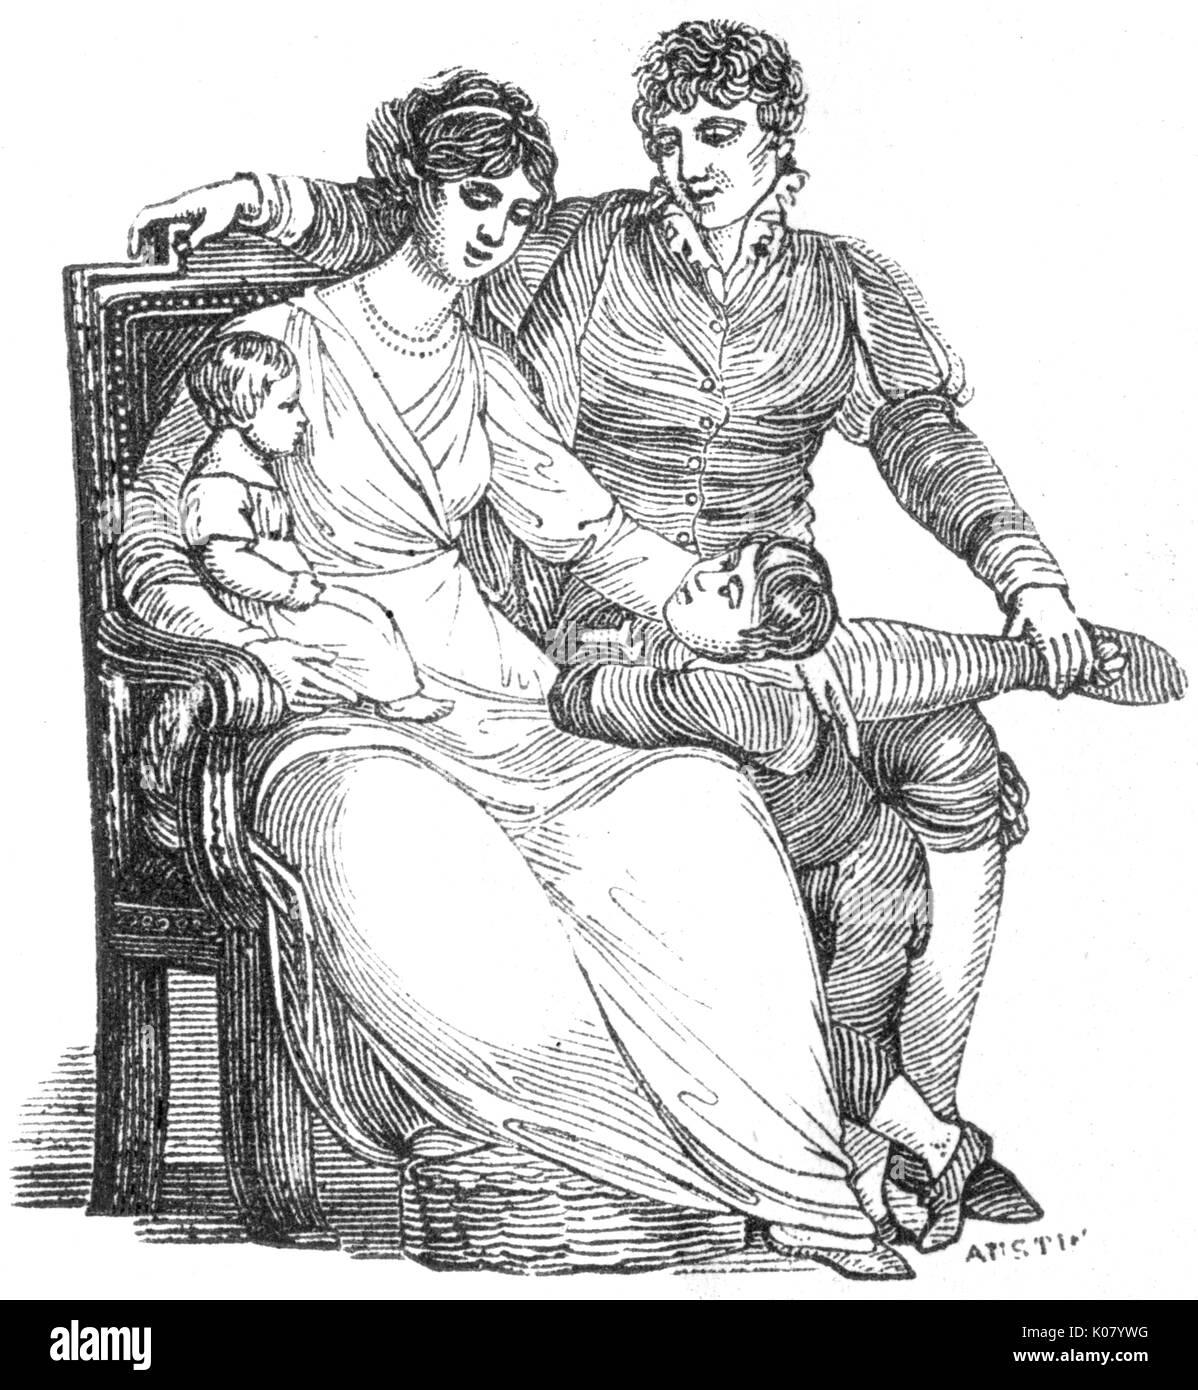 Harmonious family group, c.1820     Date: C.1820 - Stock Image